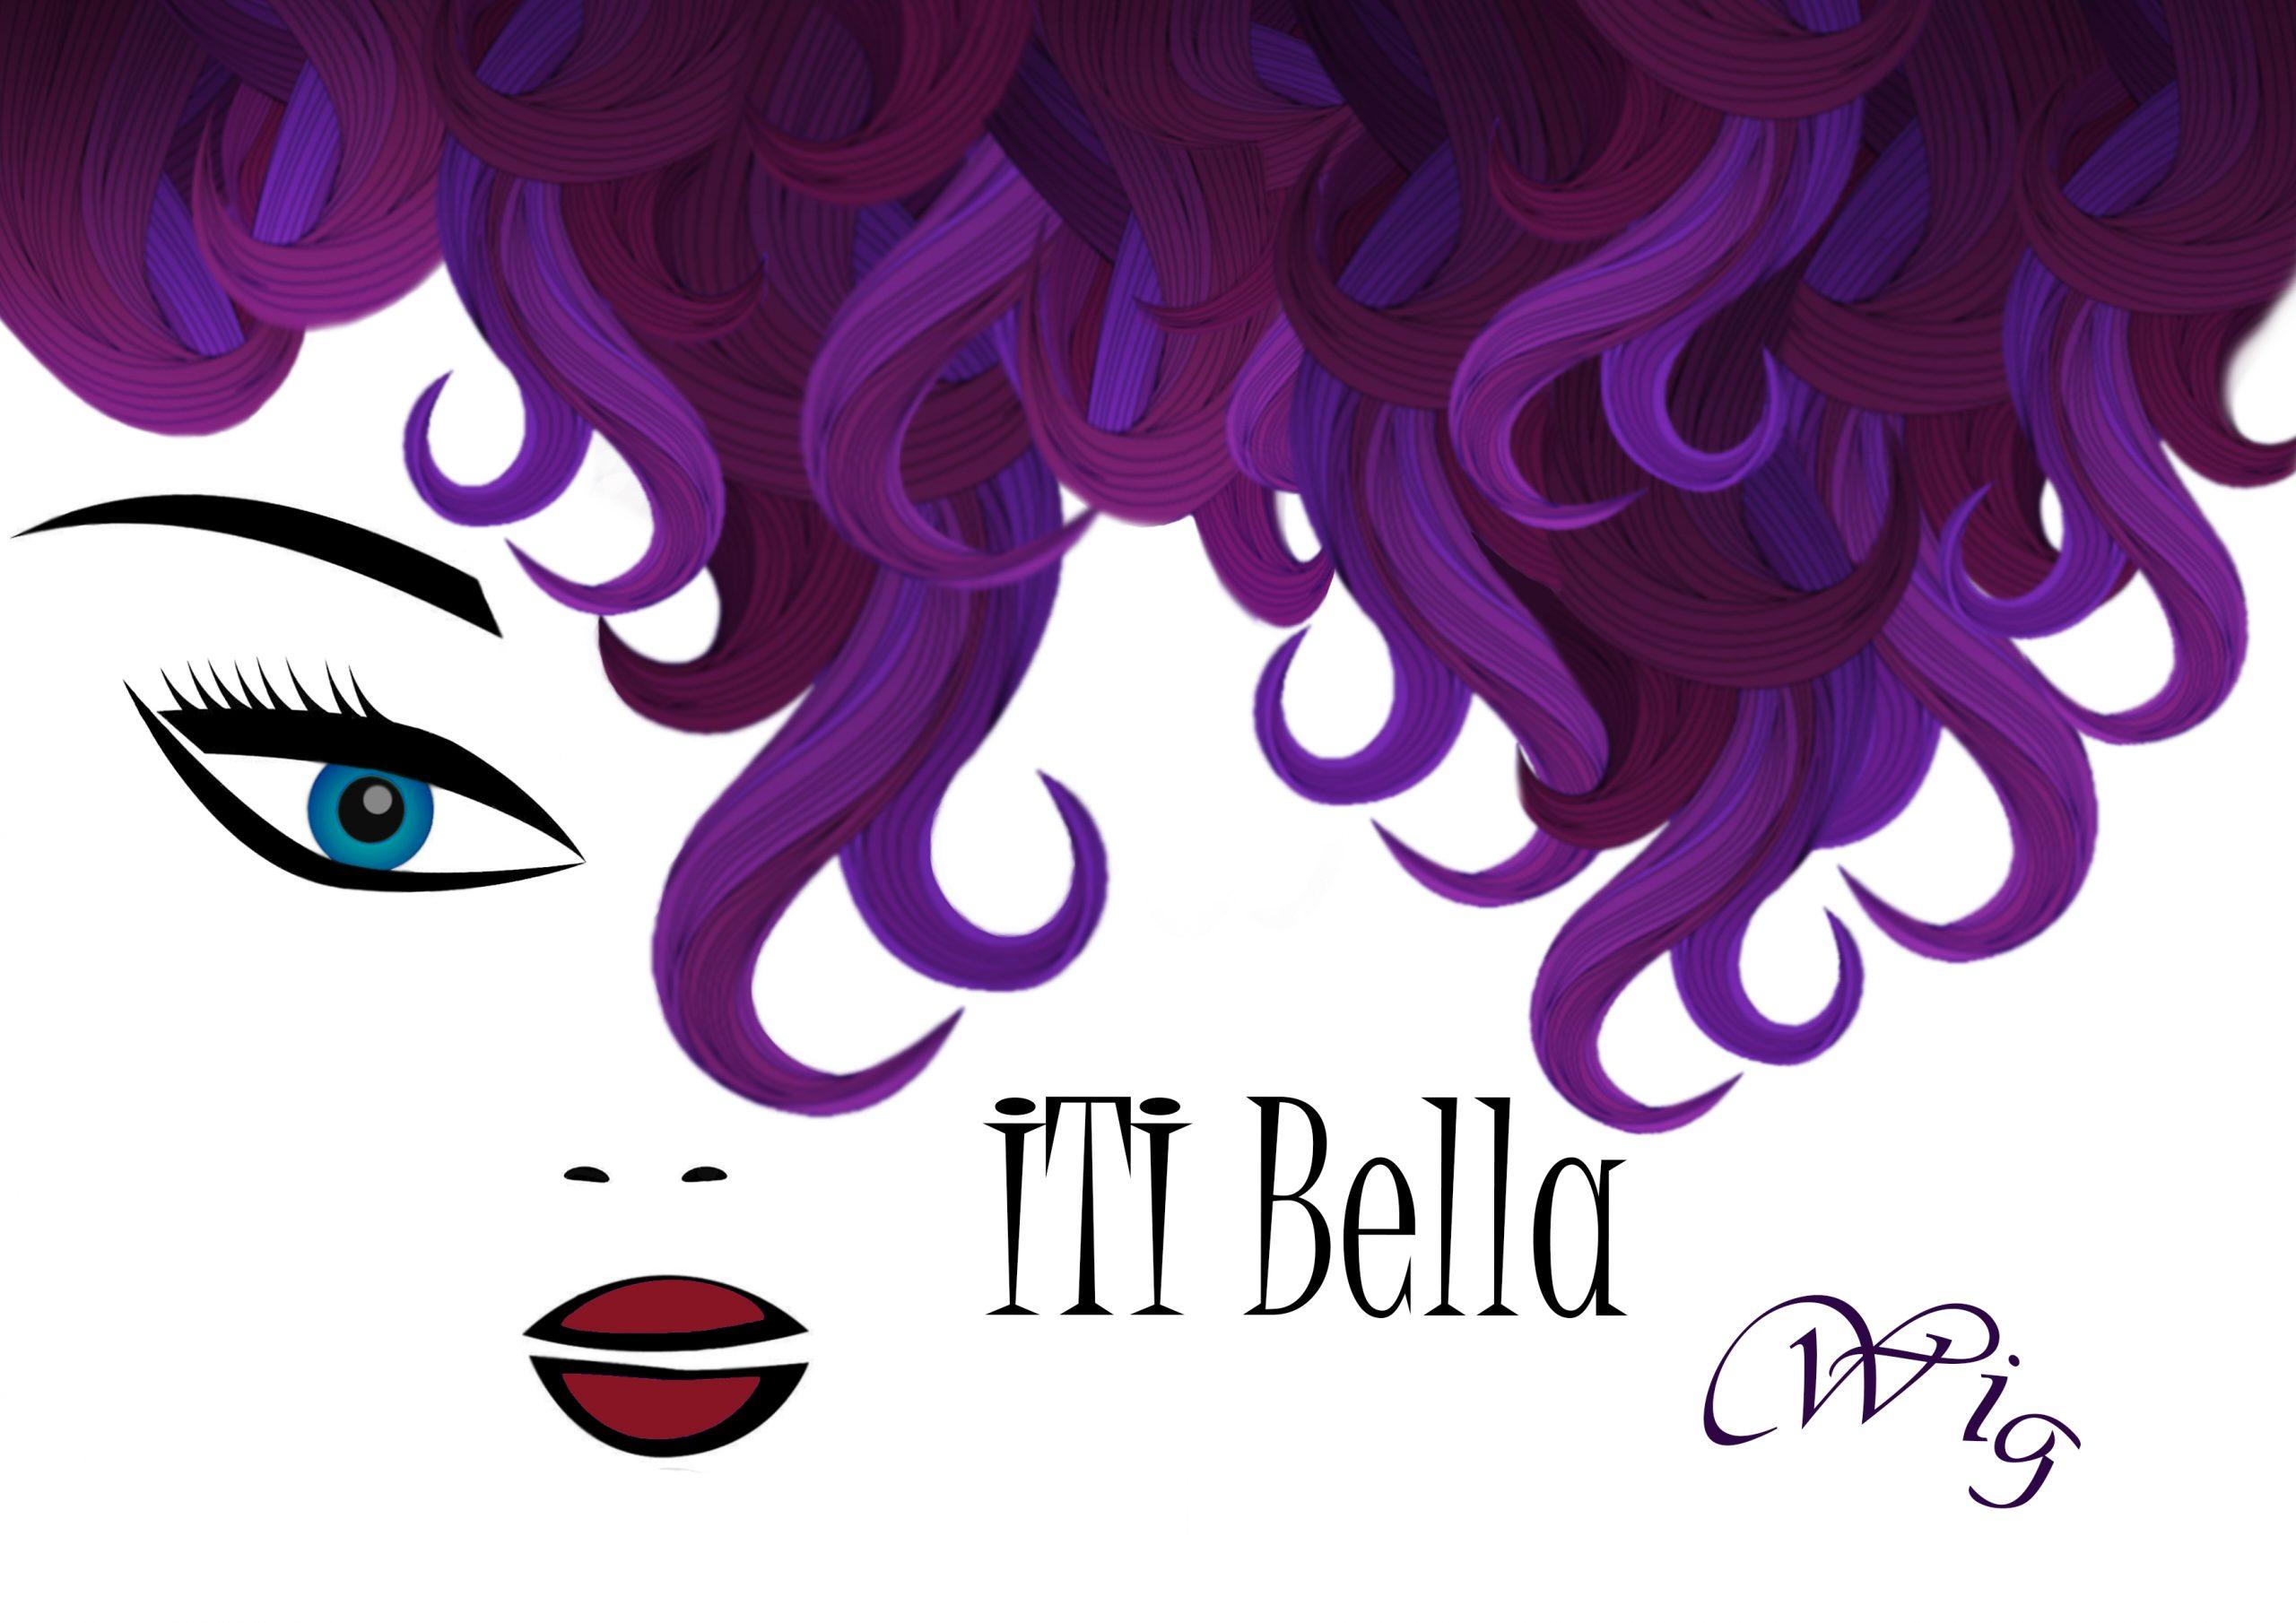 Iti Bella Wig